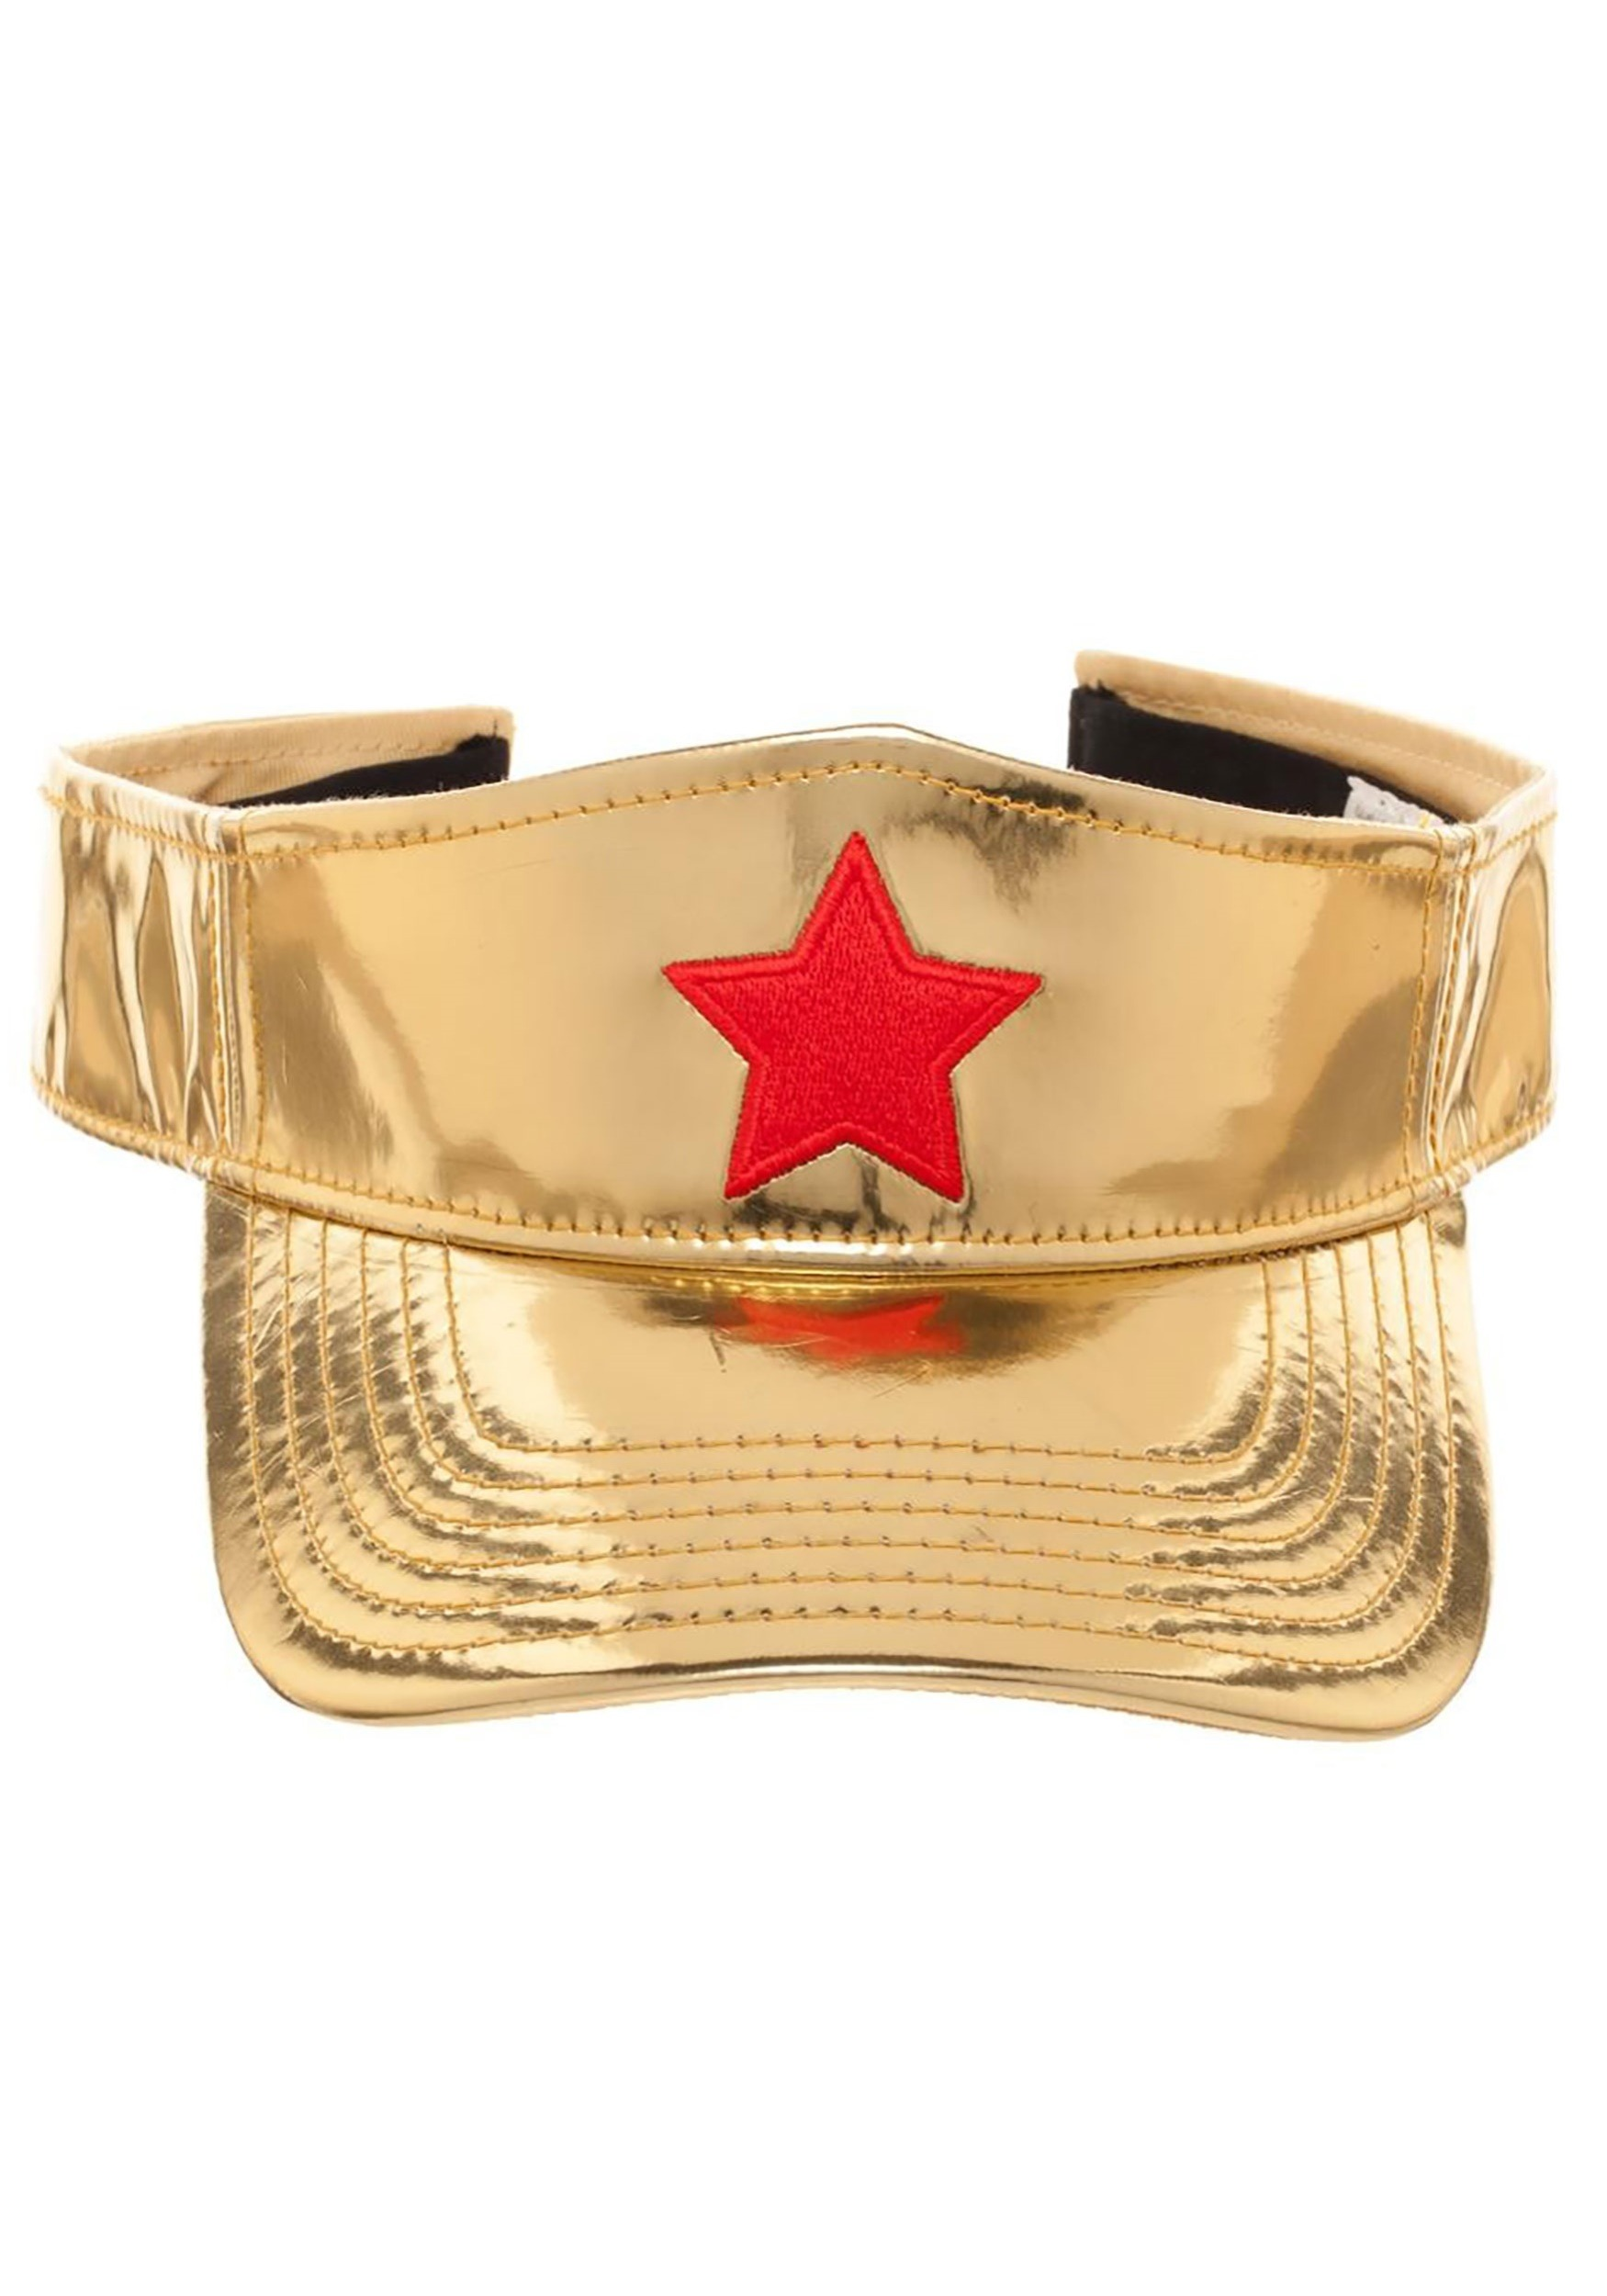 Adjustable wonder woman visor